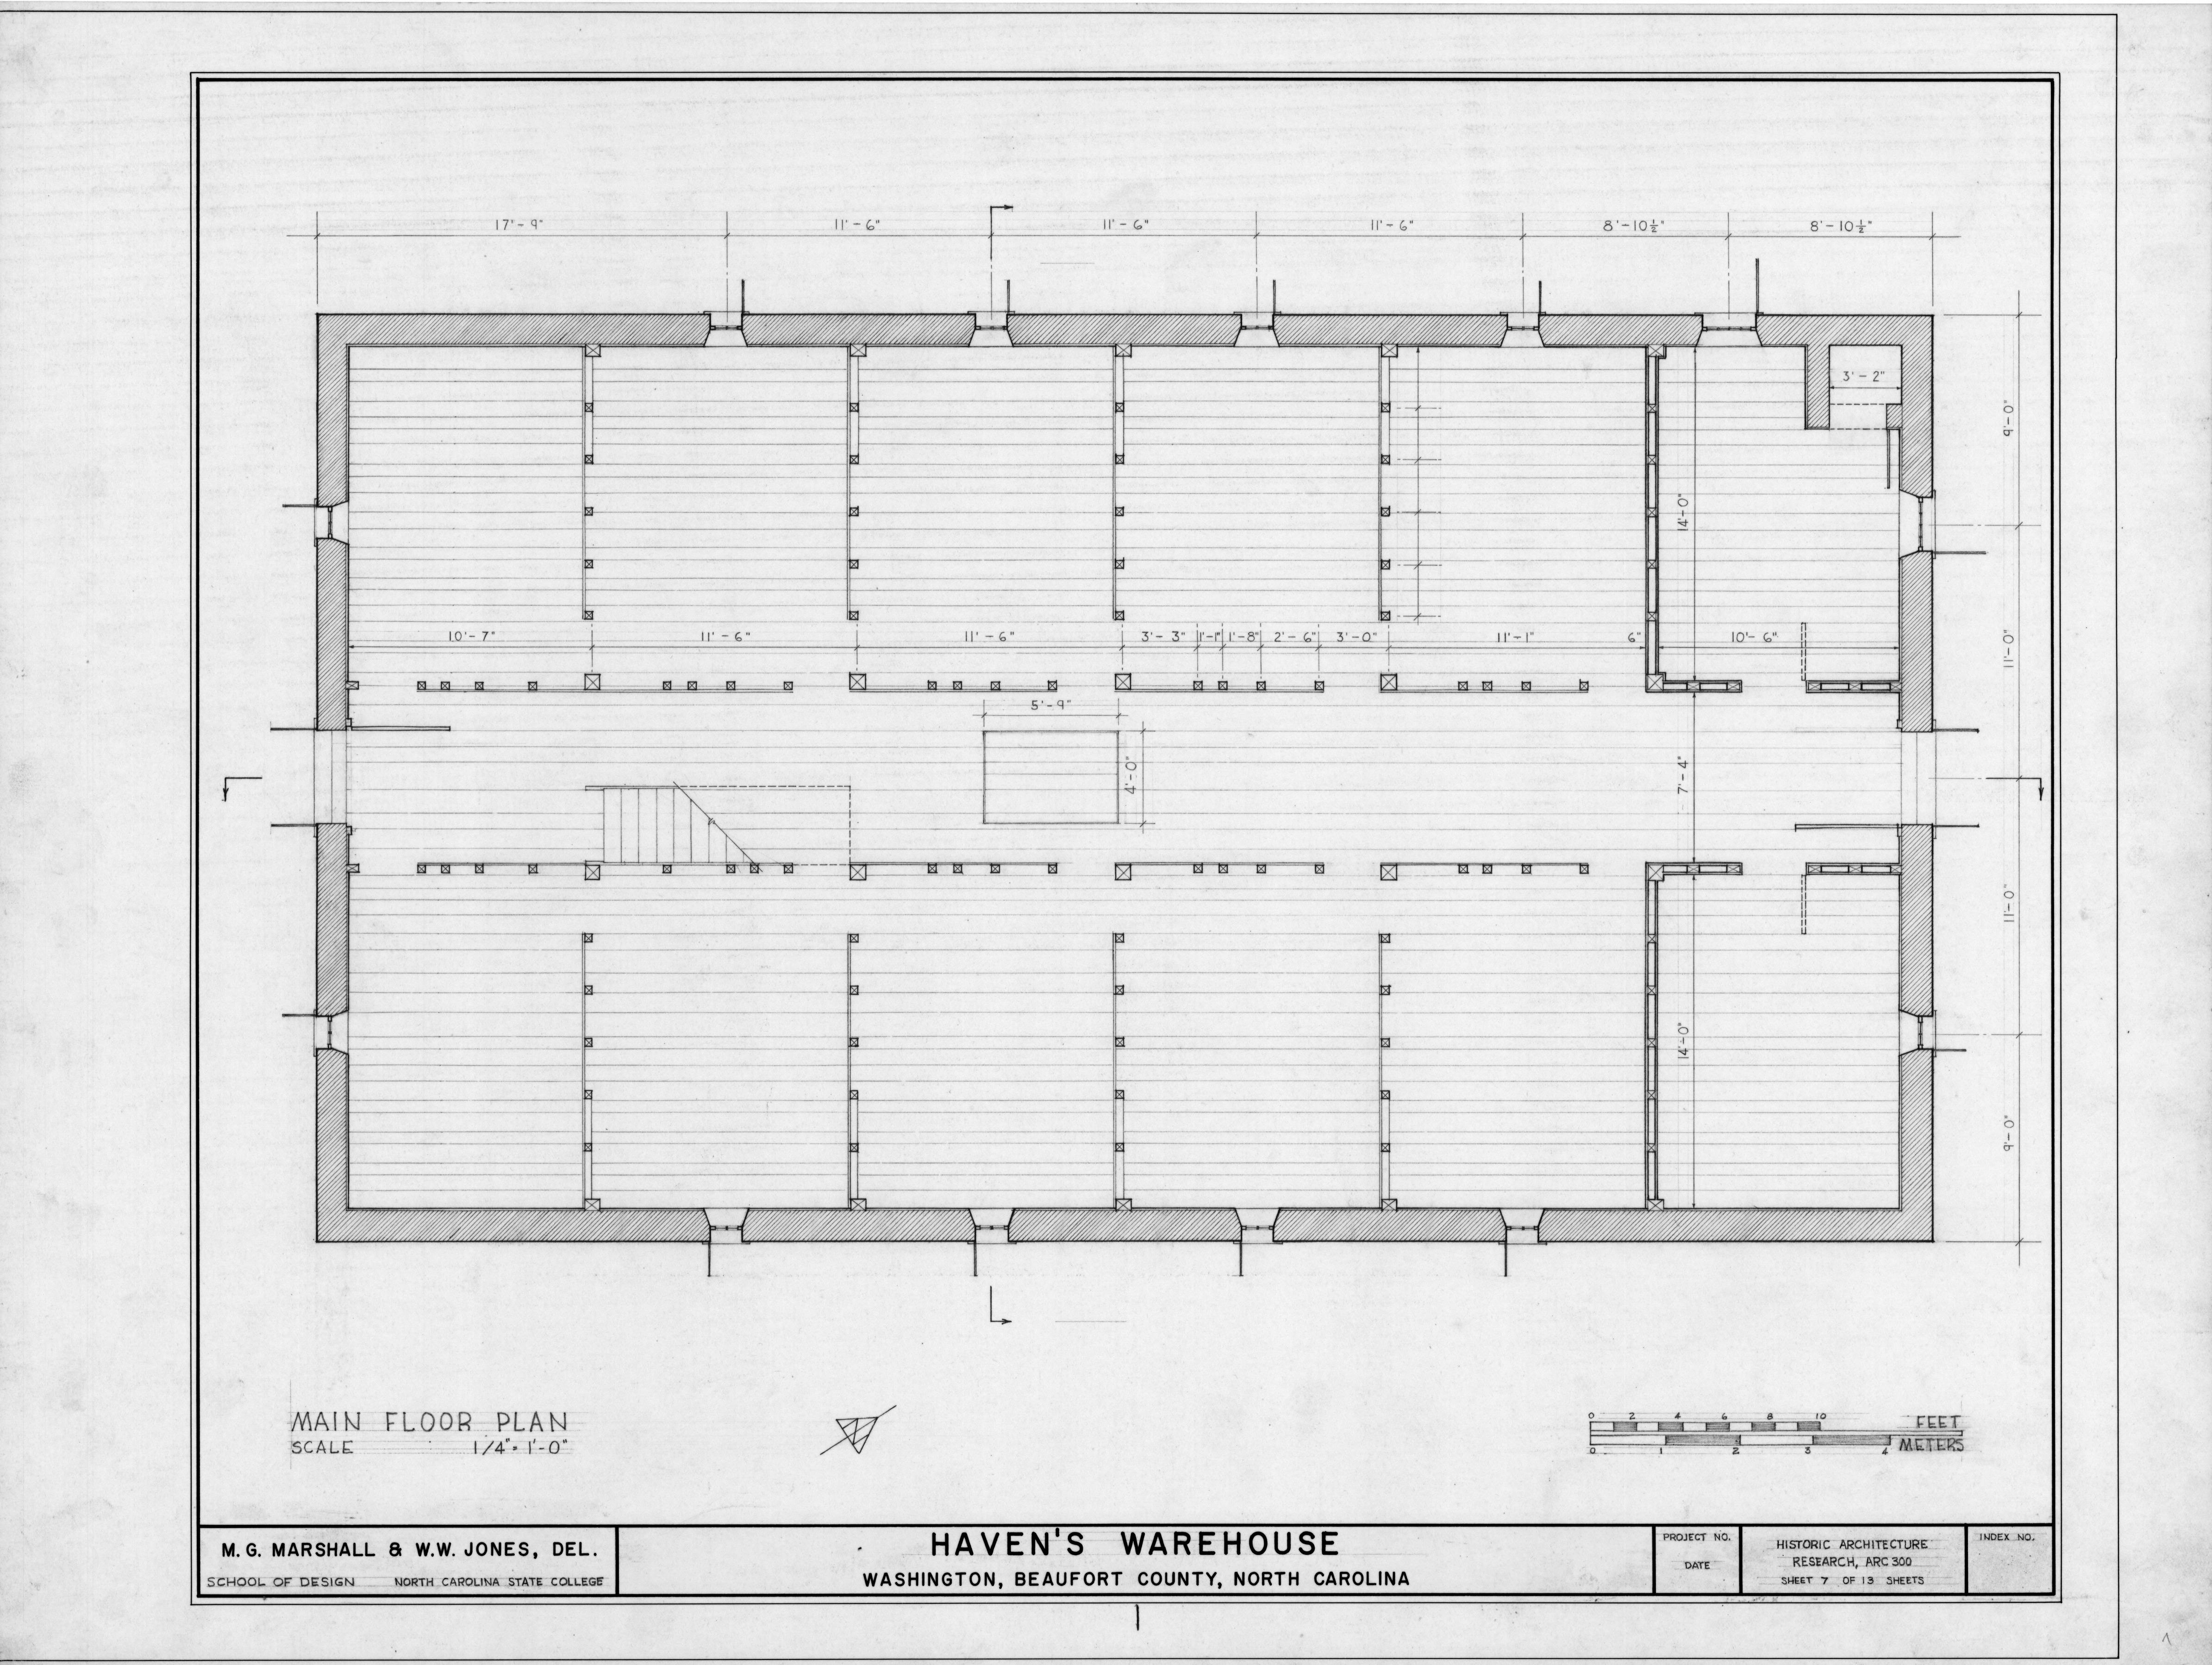 Second Floor Plan, Havens Warehouse, Washington, North